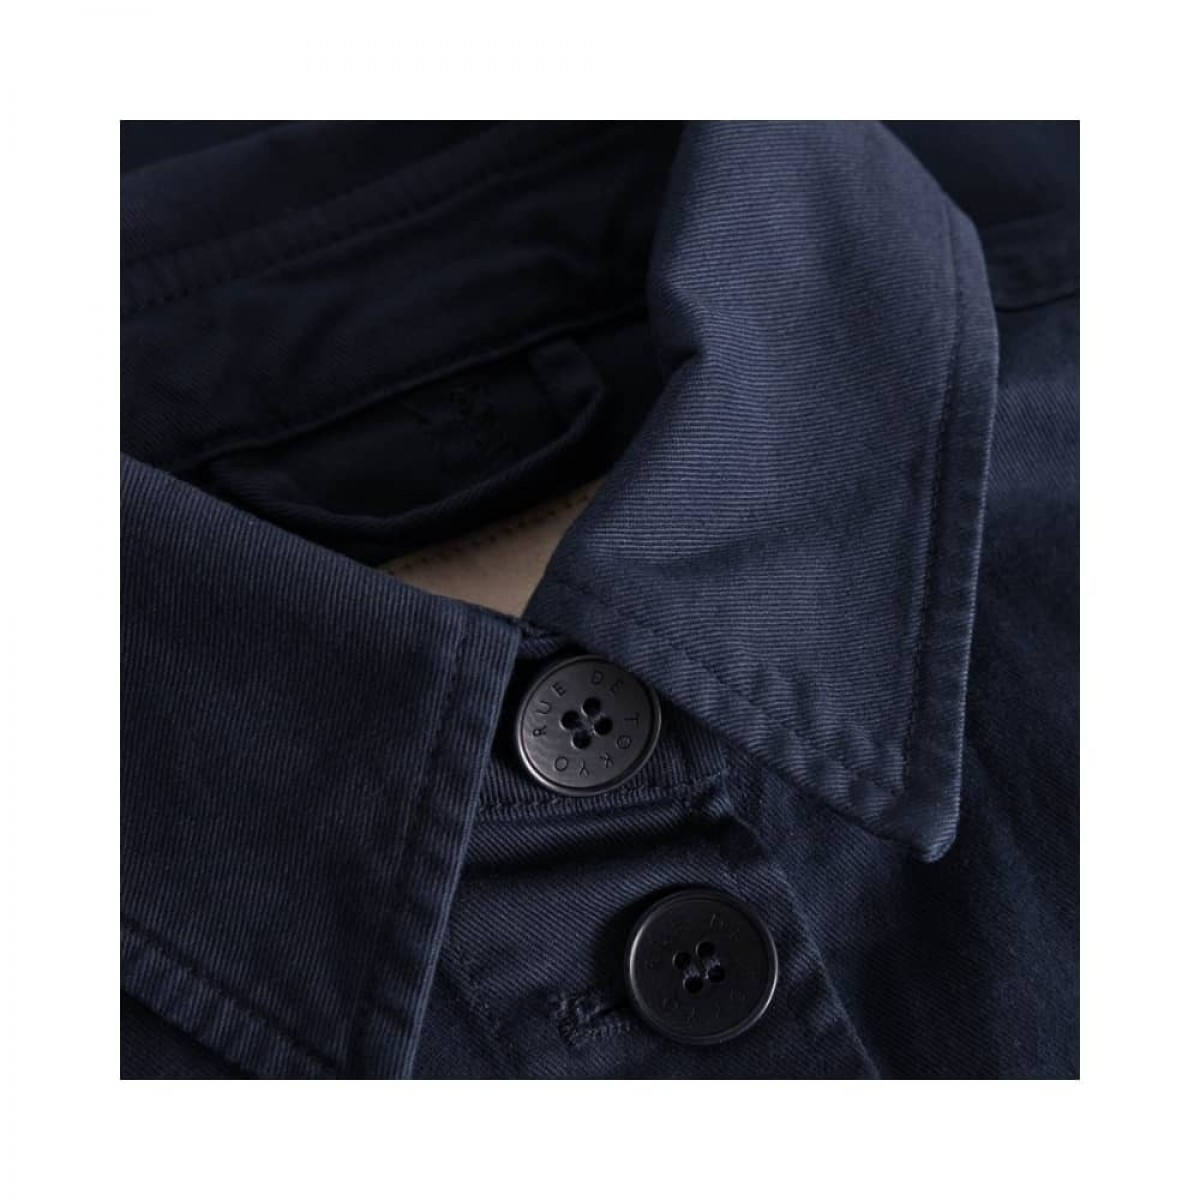 cady workwear jakke - navy - krave detalje